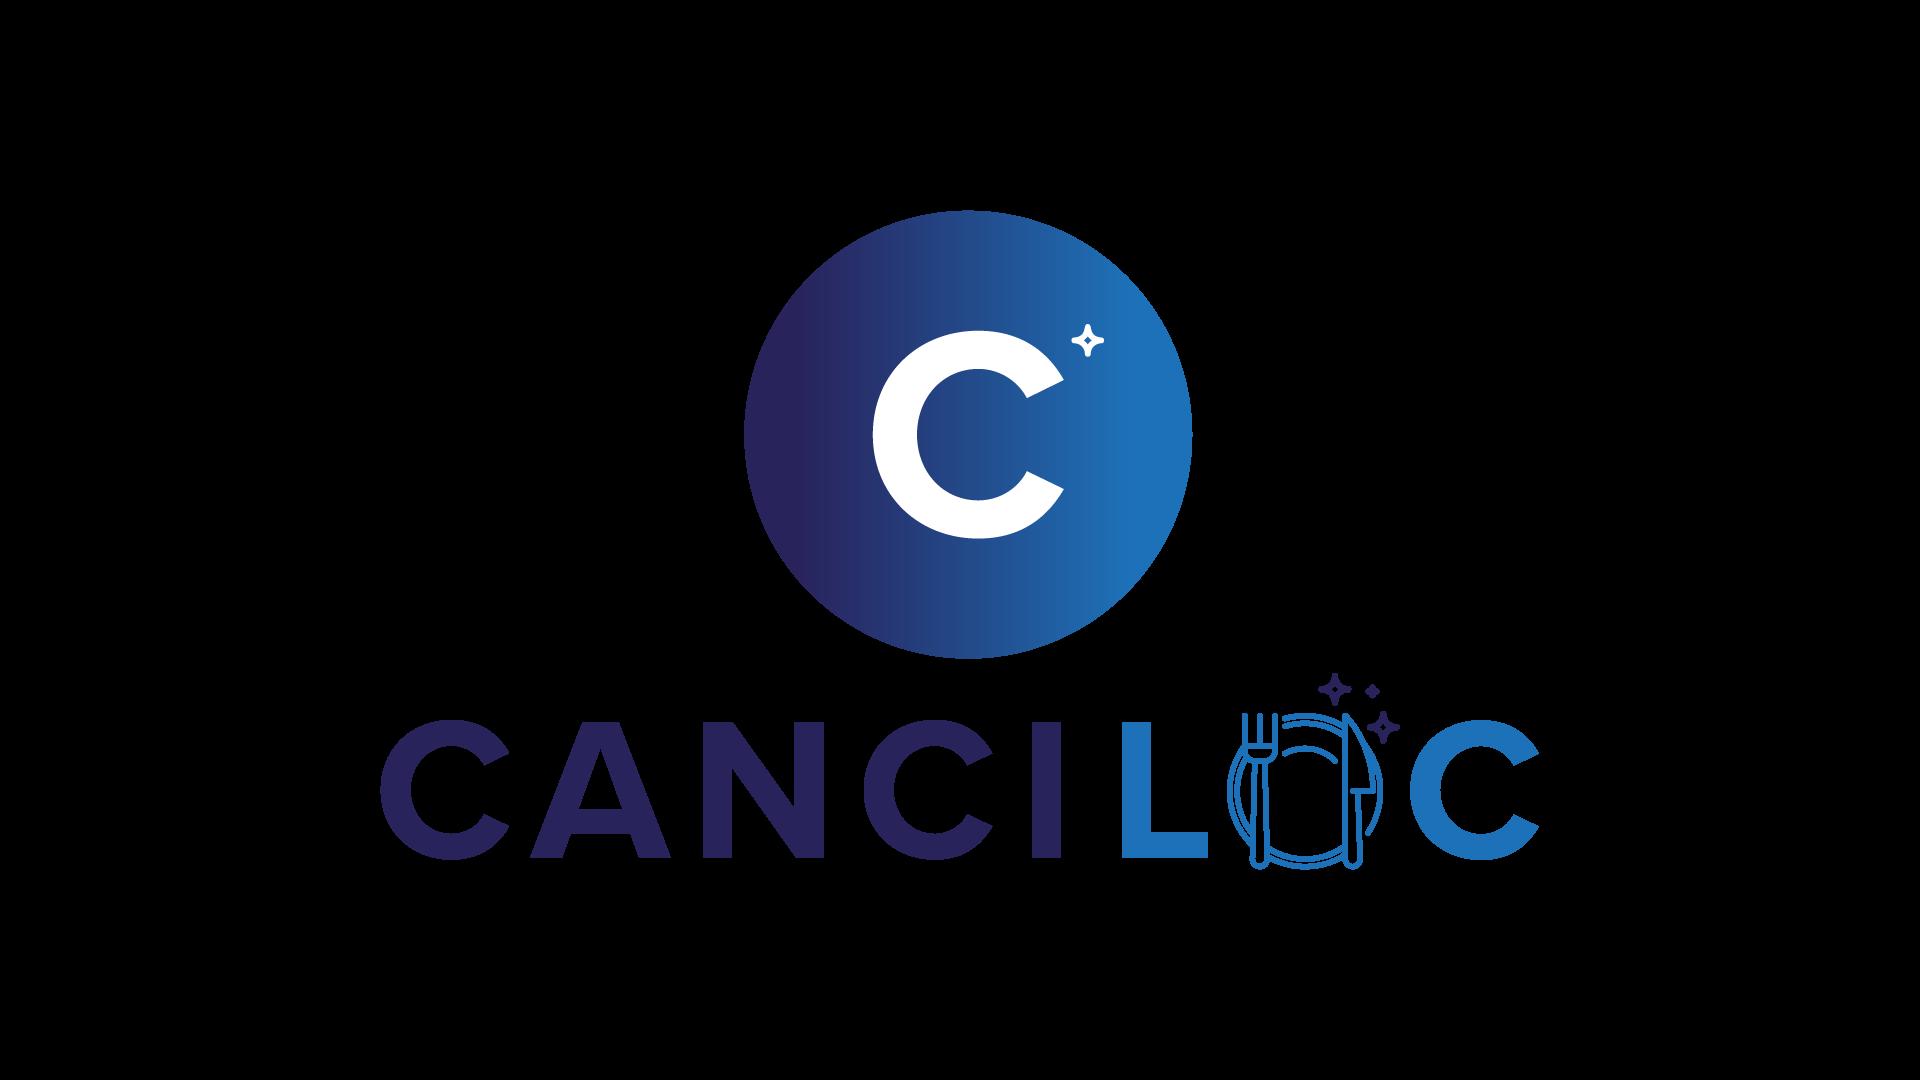 canciloc logo